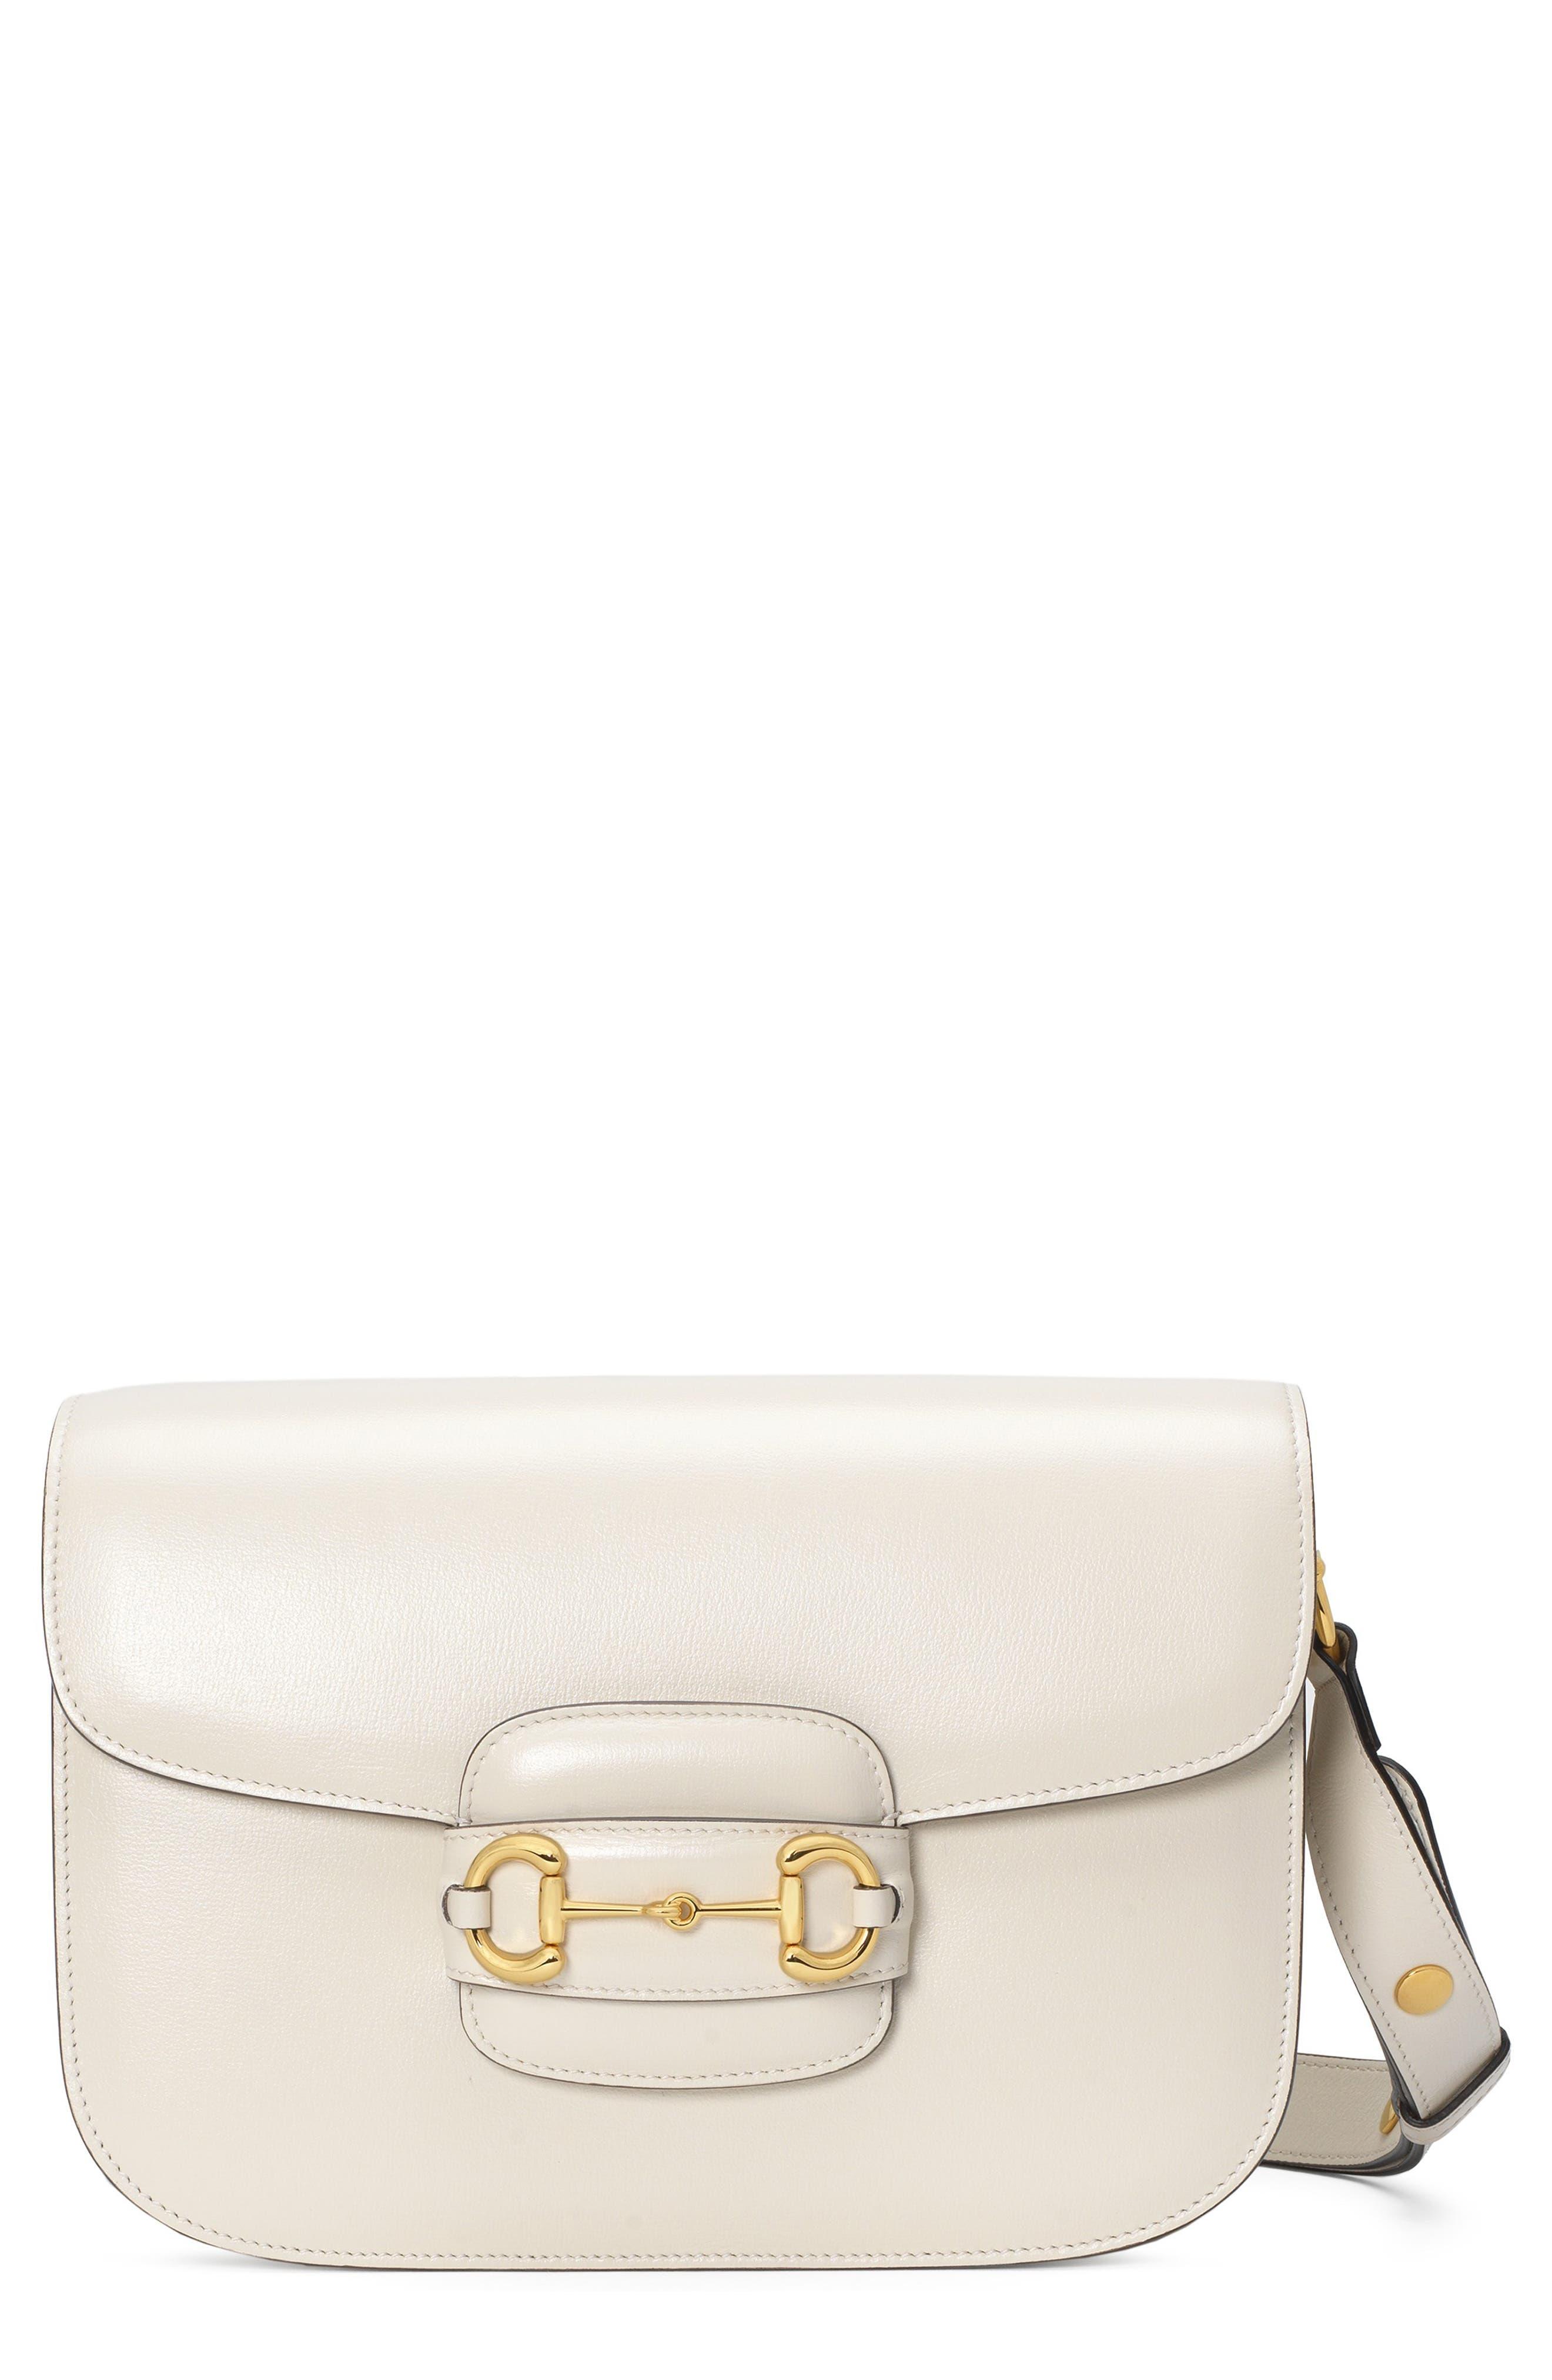 Gucci Small 1955 Horsebit Leather Shoulder Bag   Nordstrom